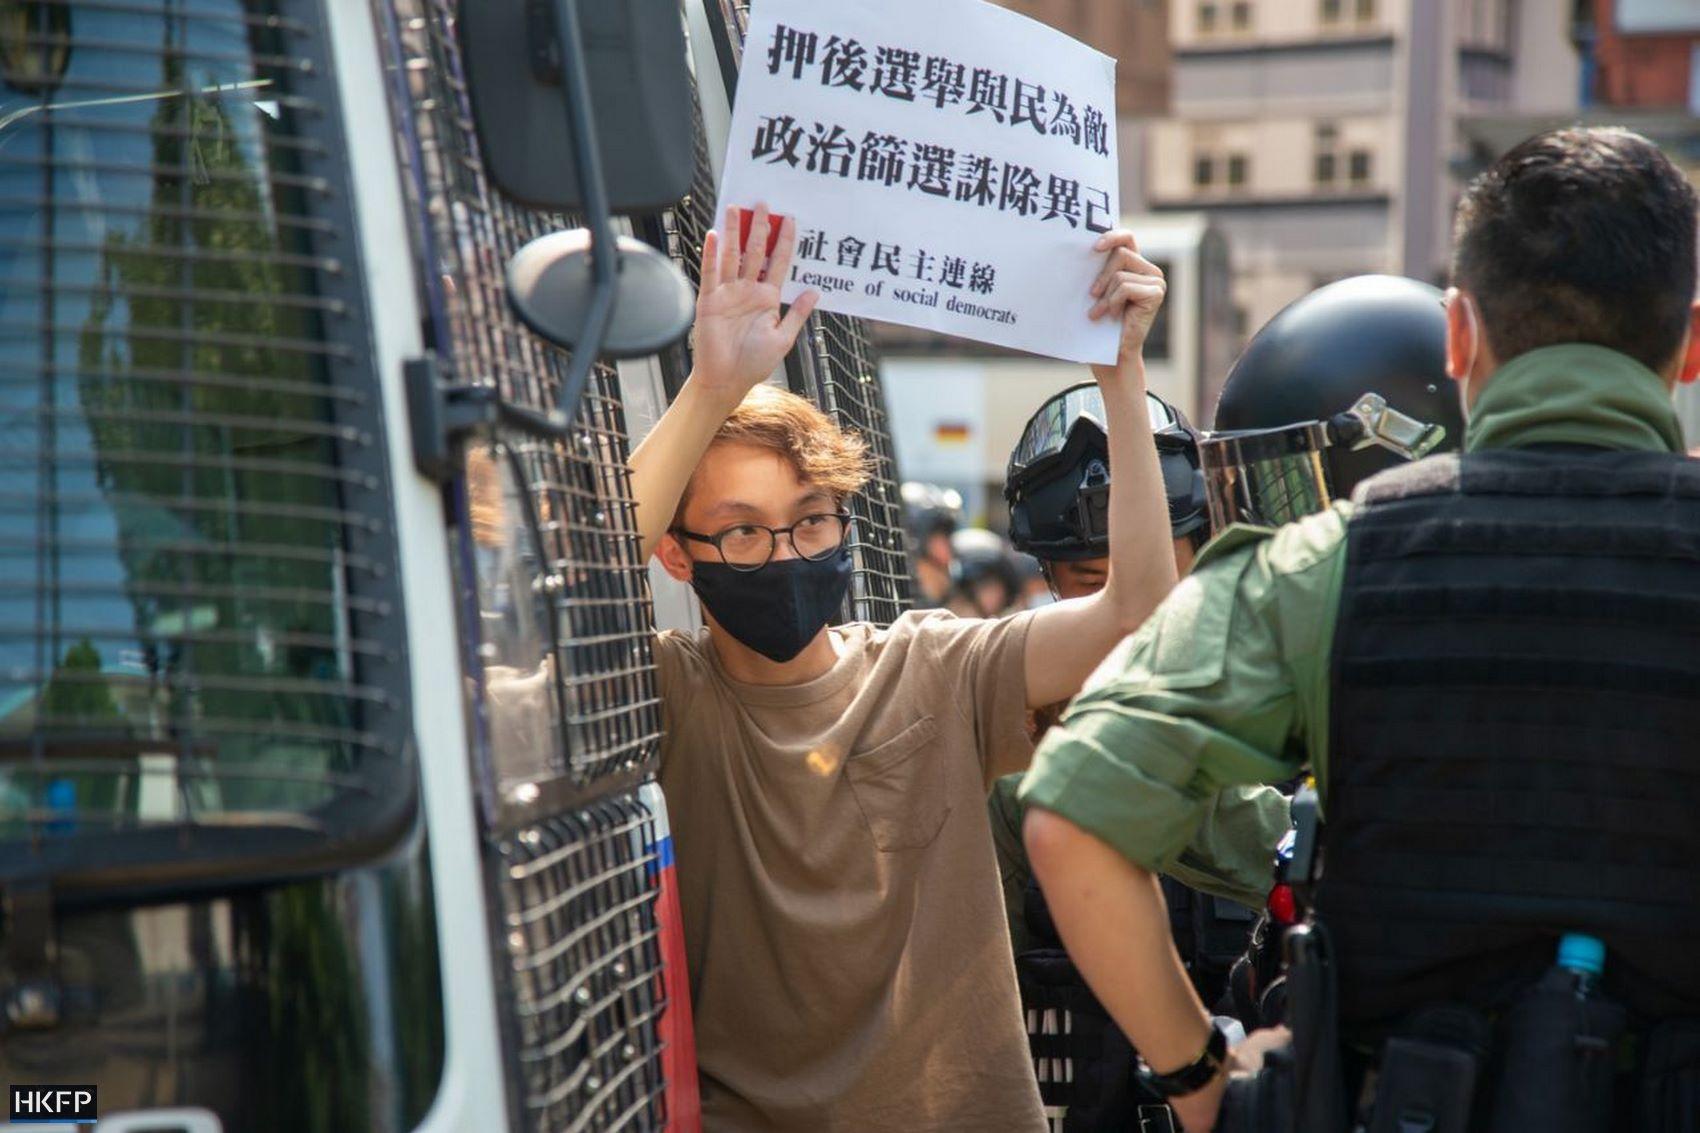 china extradition september 6 jordan joshua wong (Copy)